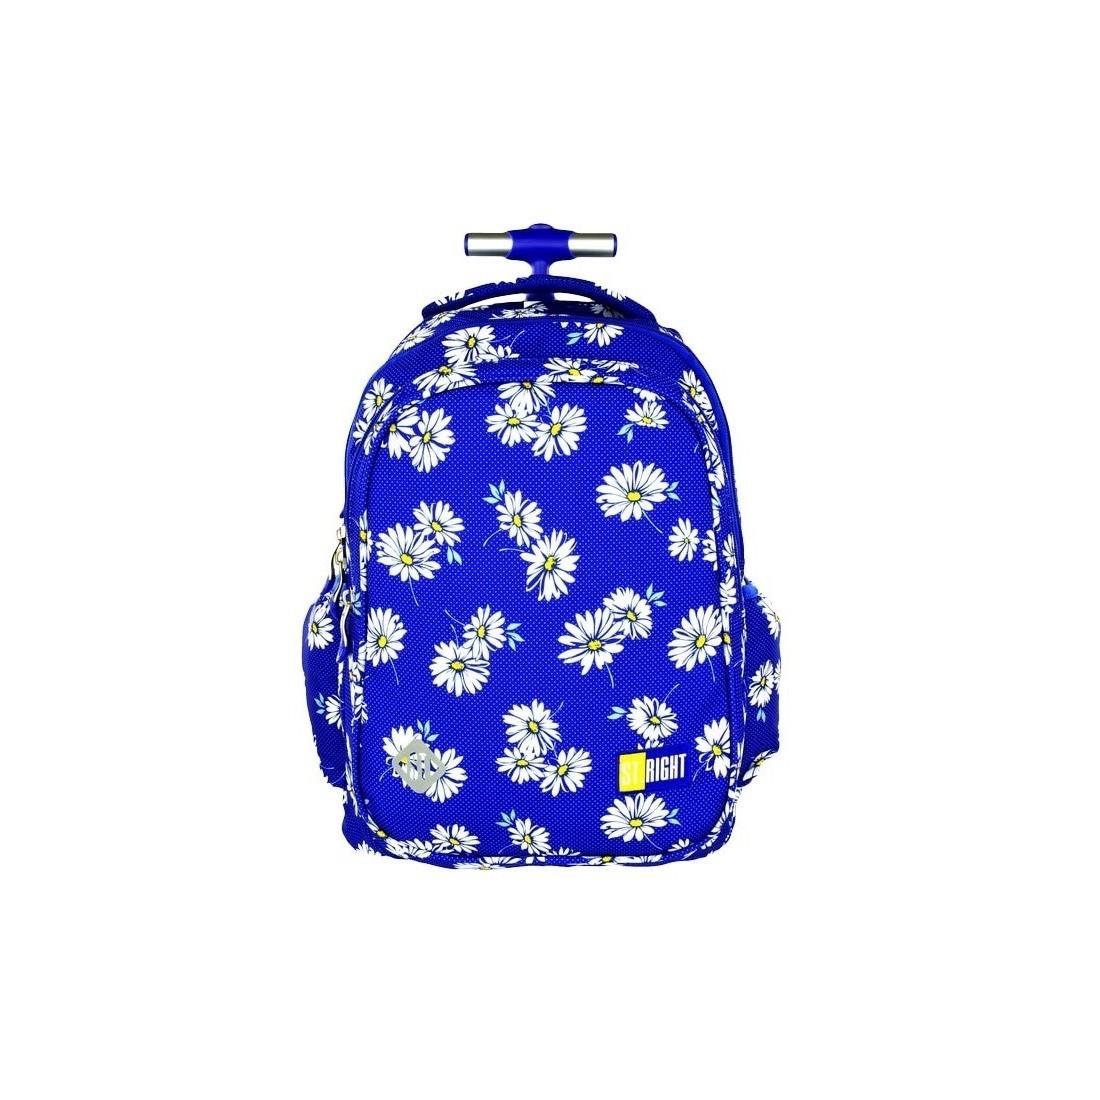 b1e1cd3288a46 Plecak szkolny na kółkach St.Right Daises dla dziewczynki - plecak -tornister.pl